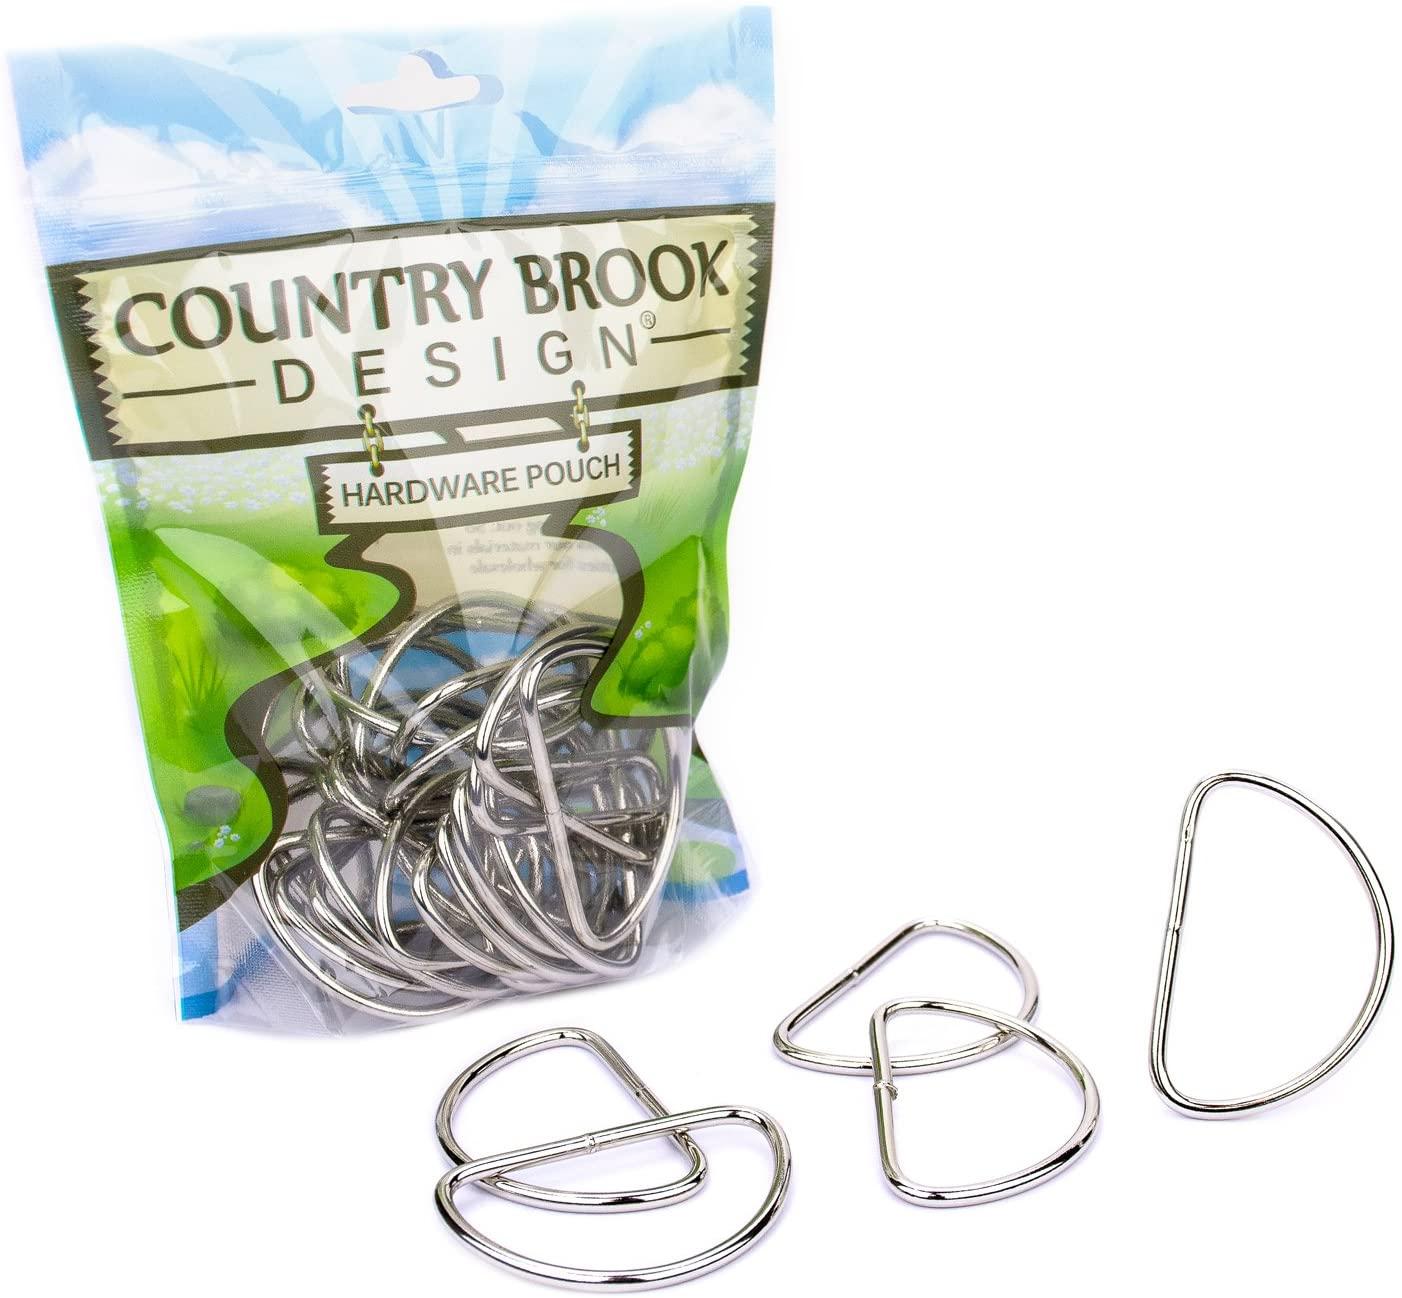 Country Brook Design - 2 Inch Nickel Plated Welded Lite D-Rings (50 Pack)